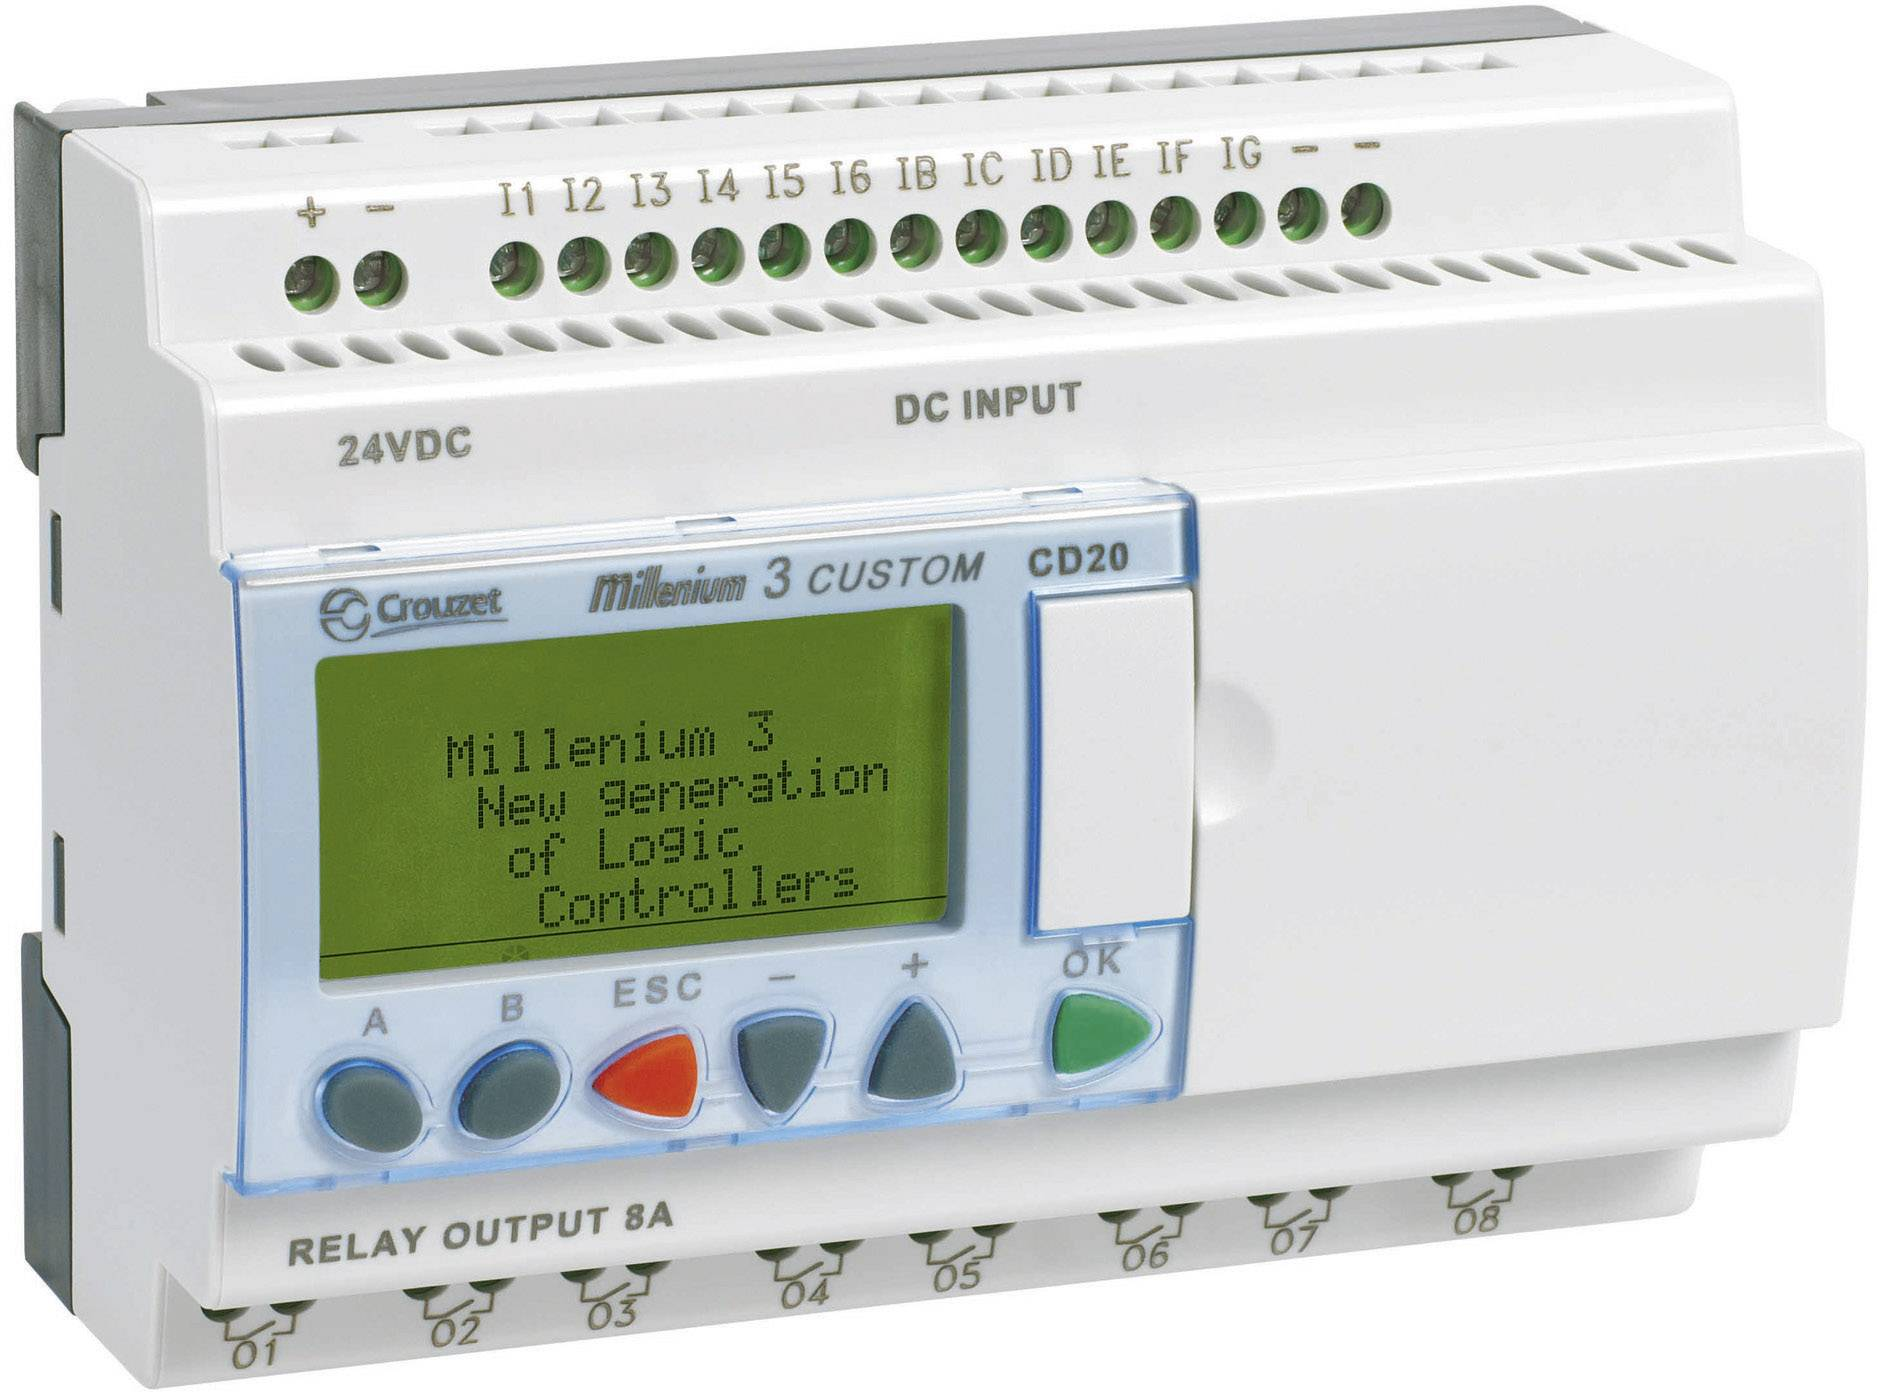 PLC řídicí modul Crouzet Millenium 3 CD20 88970051 24 V/DC